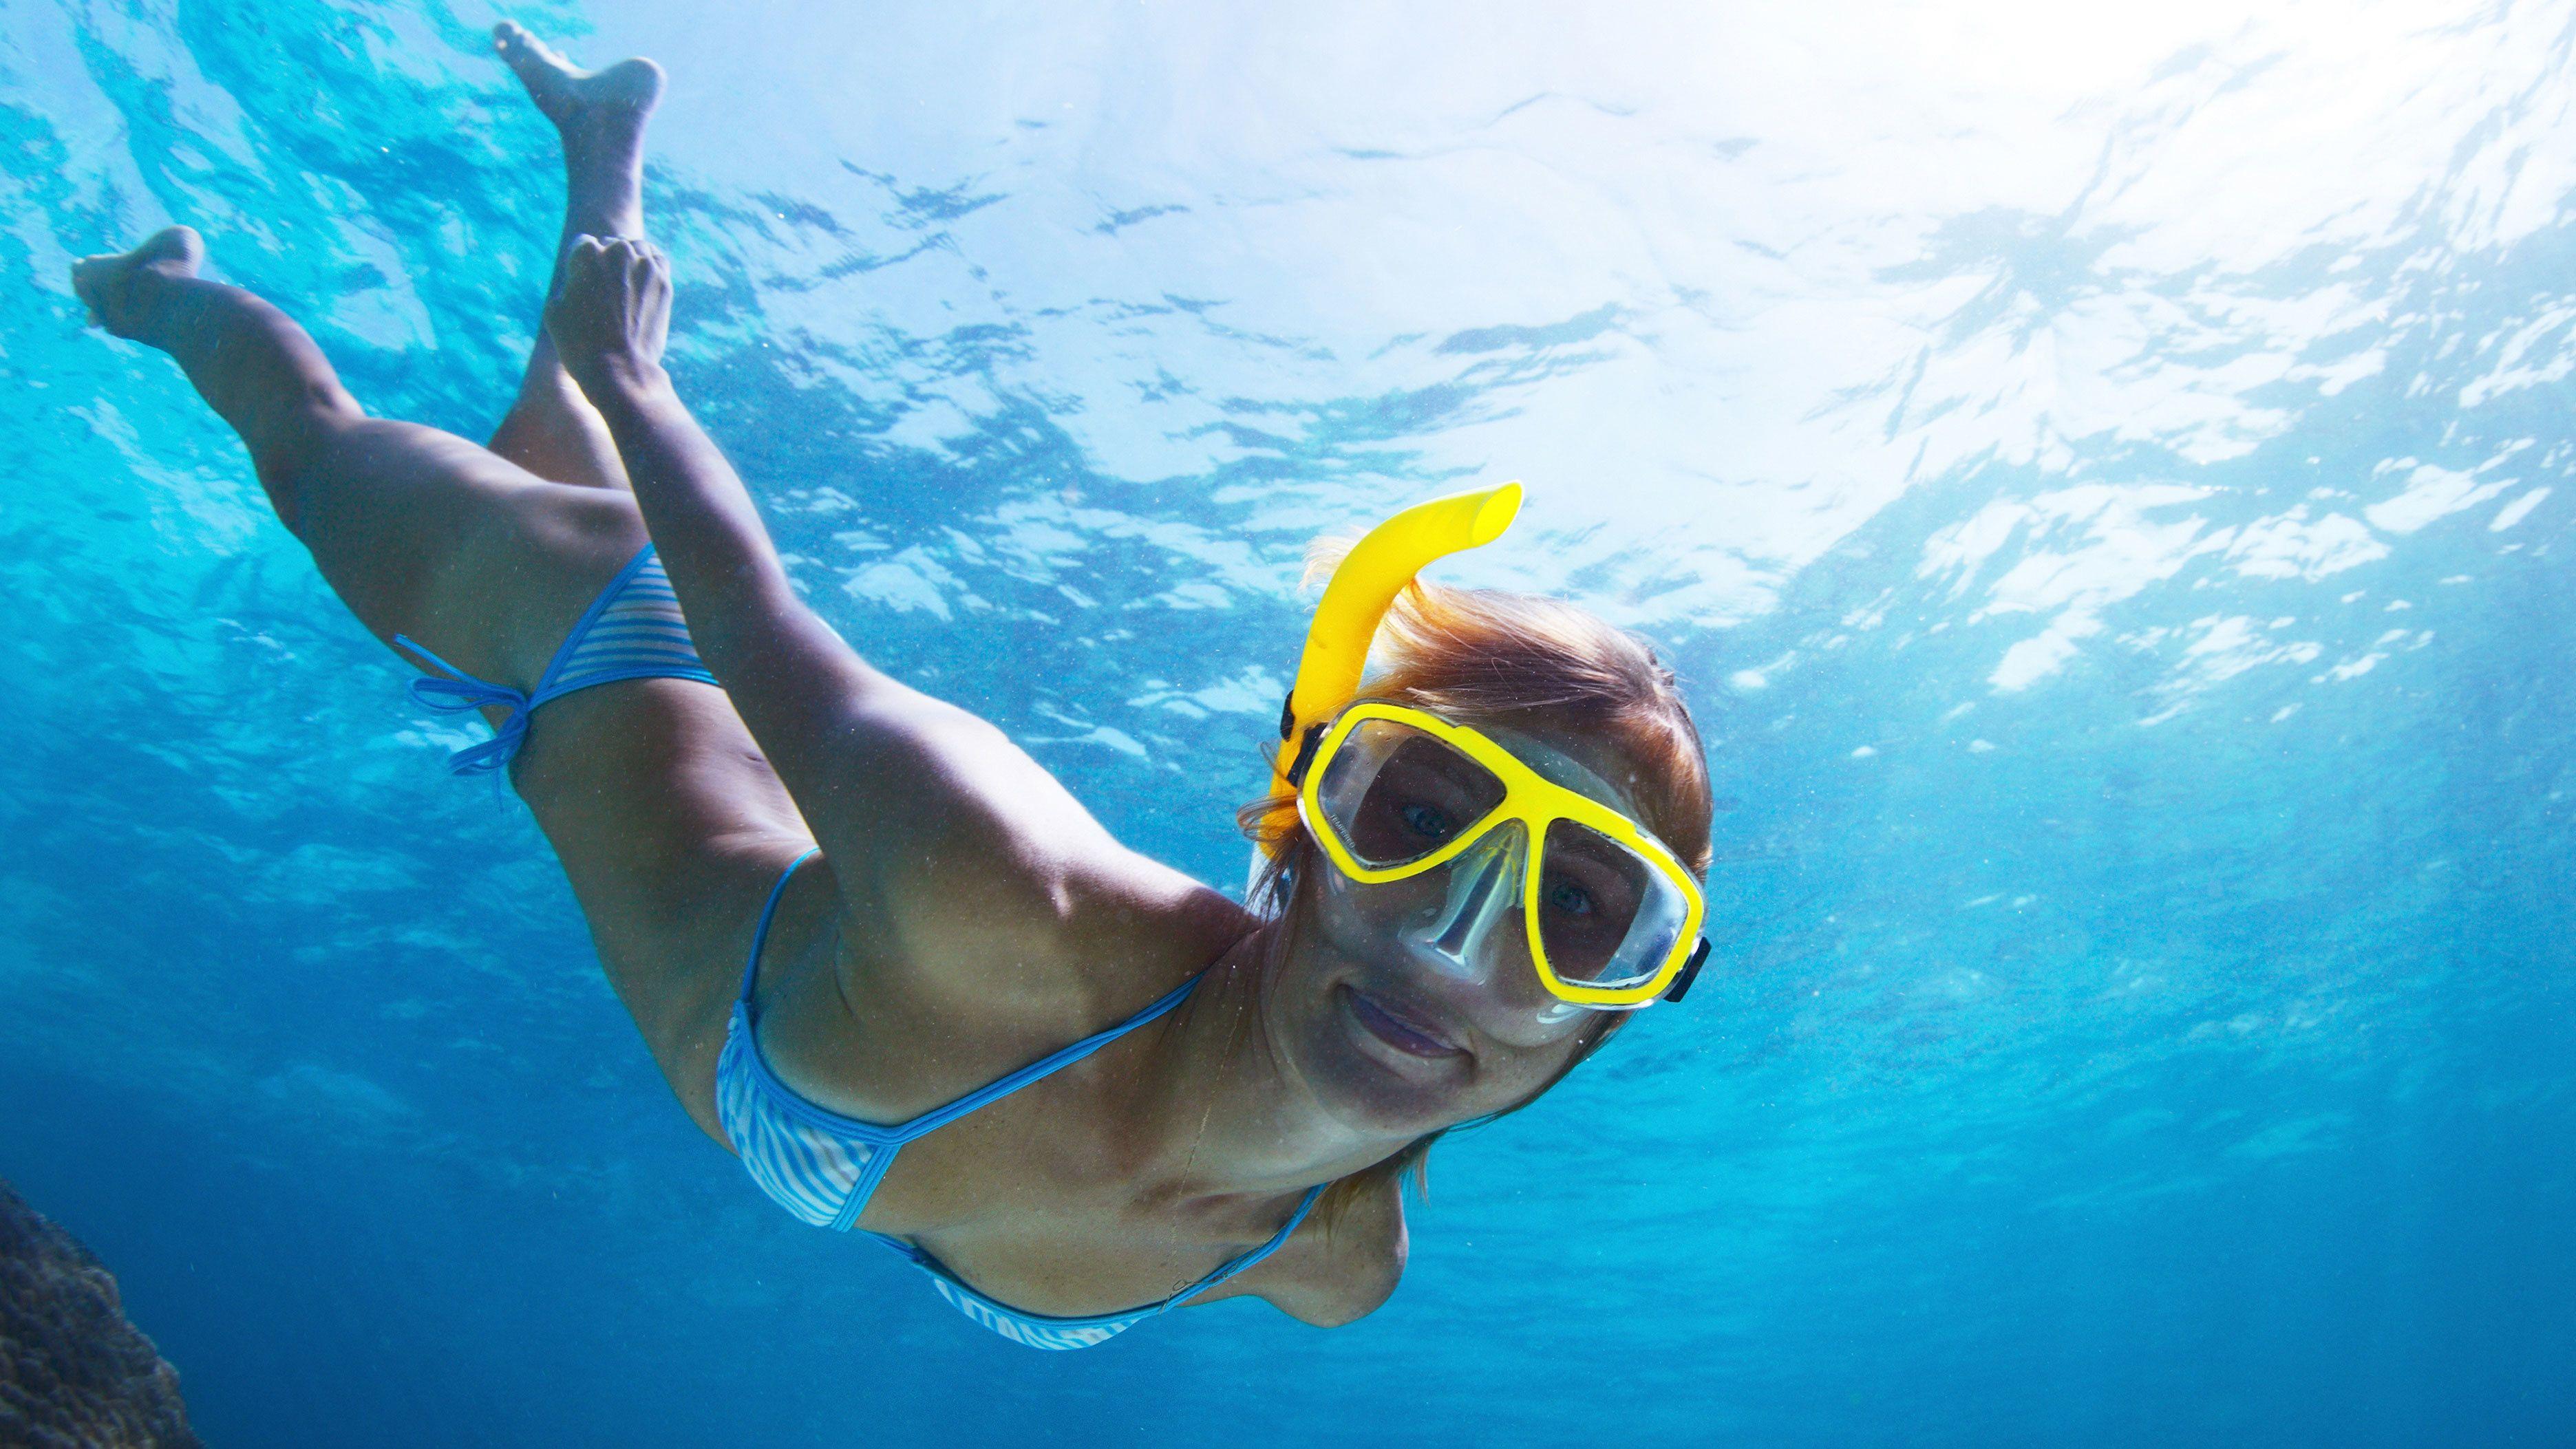 Rincon Snorkeling Adventure